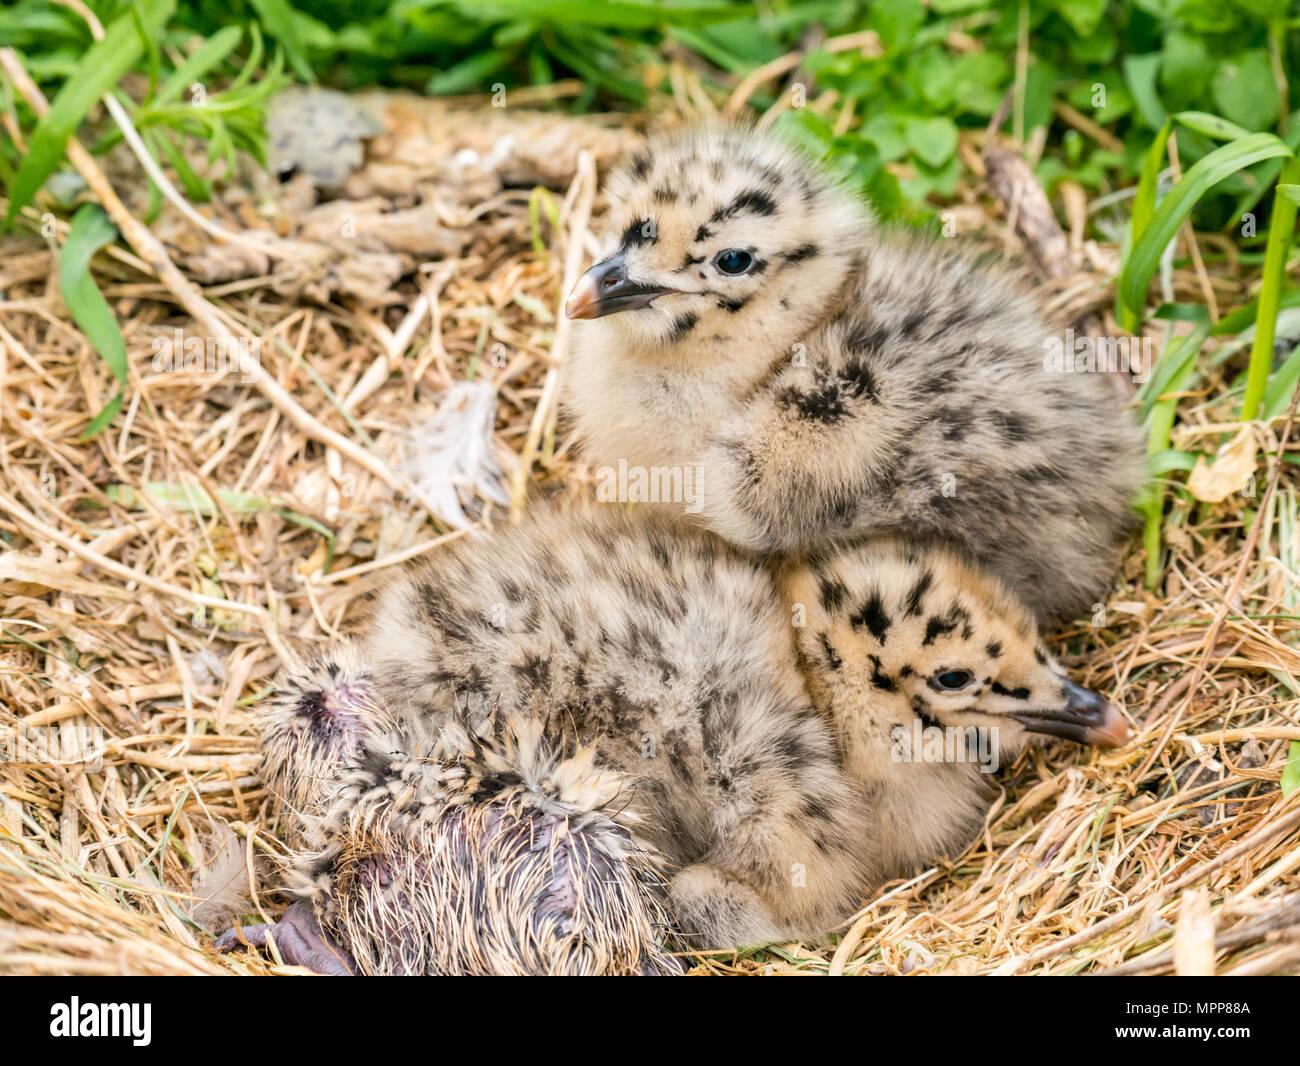 puffin-burrow-count-craigleith-island-24